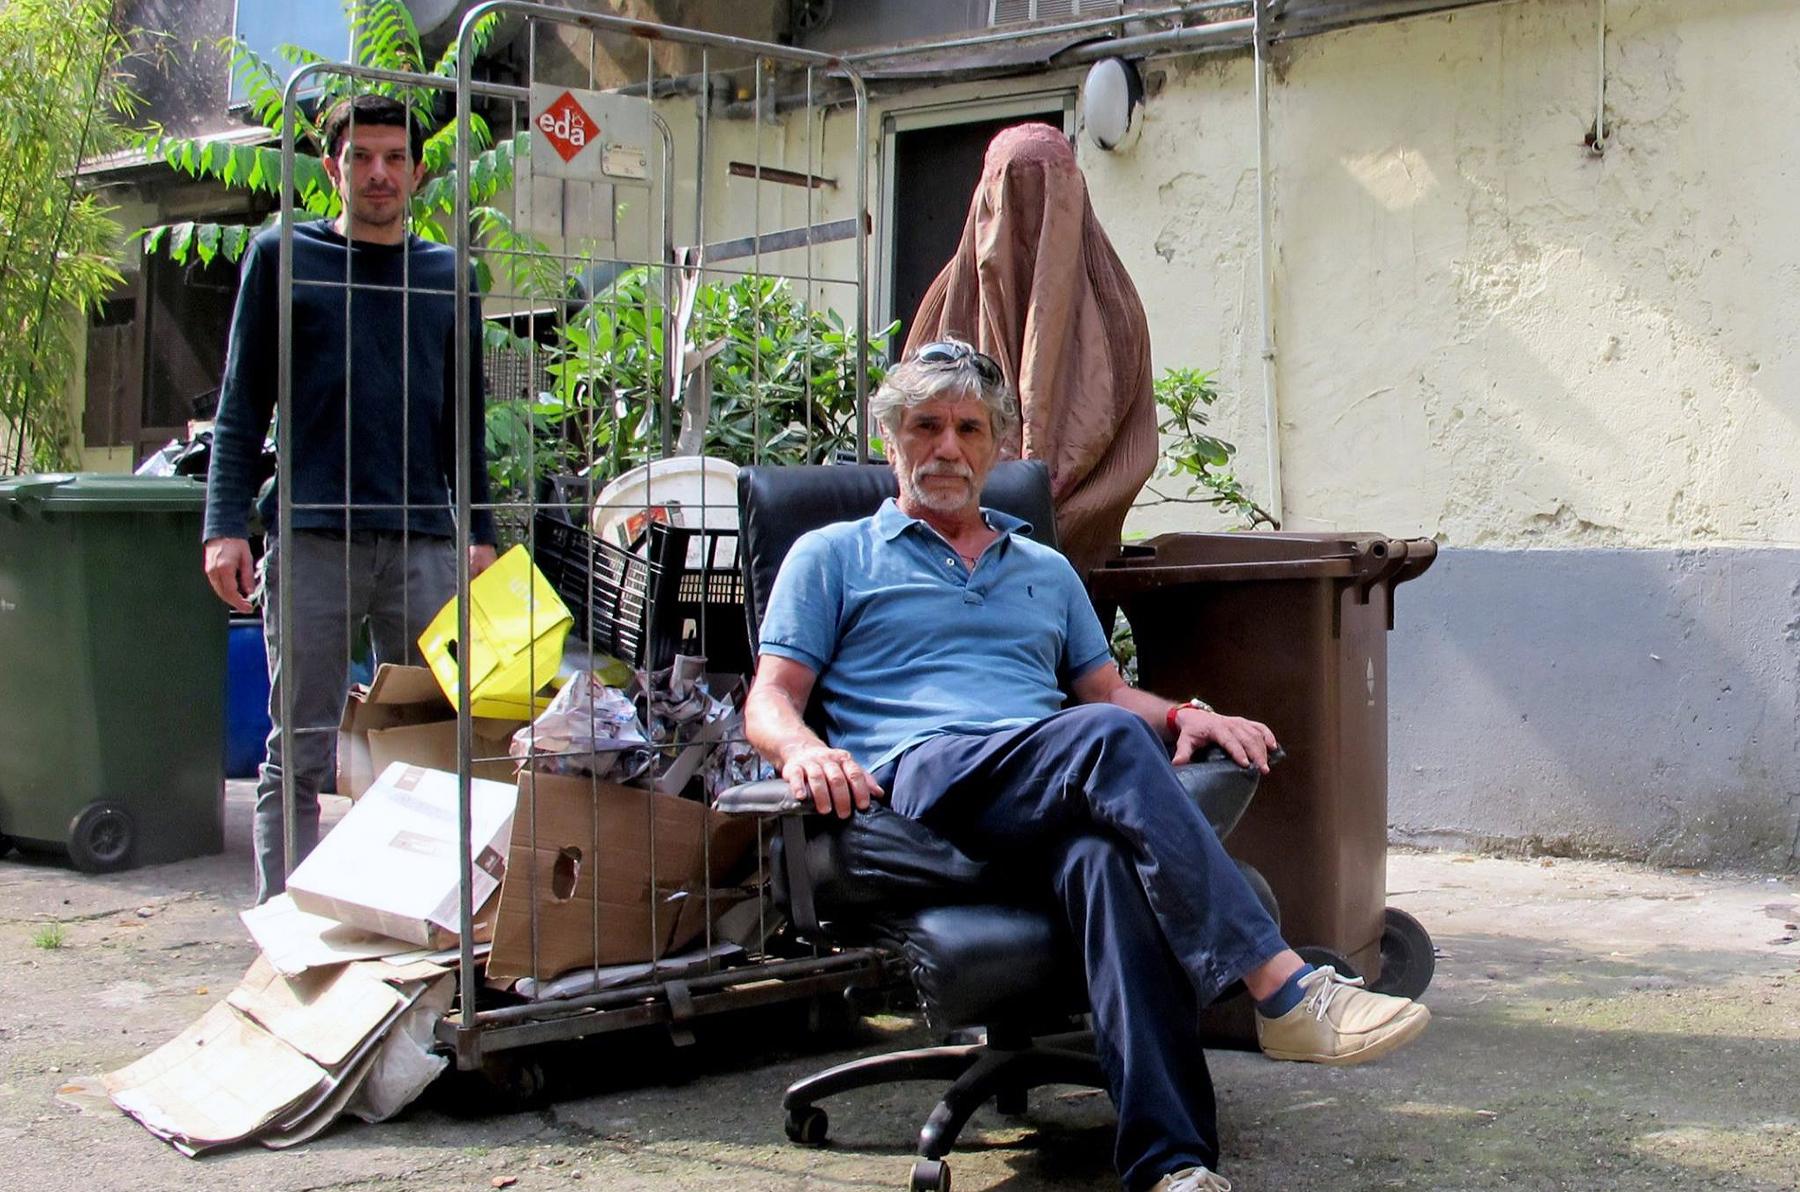 Rahman Hak-Hagir - @ VIALE BLIGNY 42 ARTIST SHOT